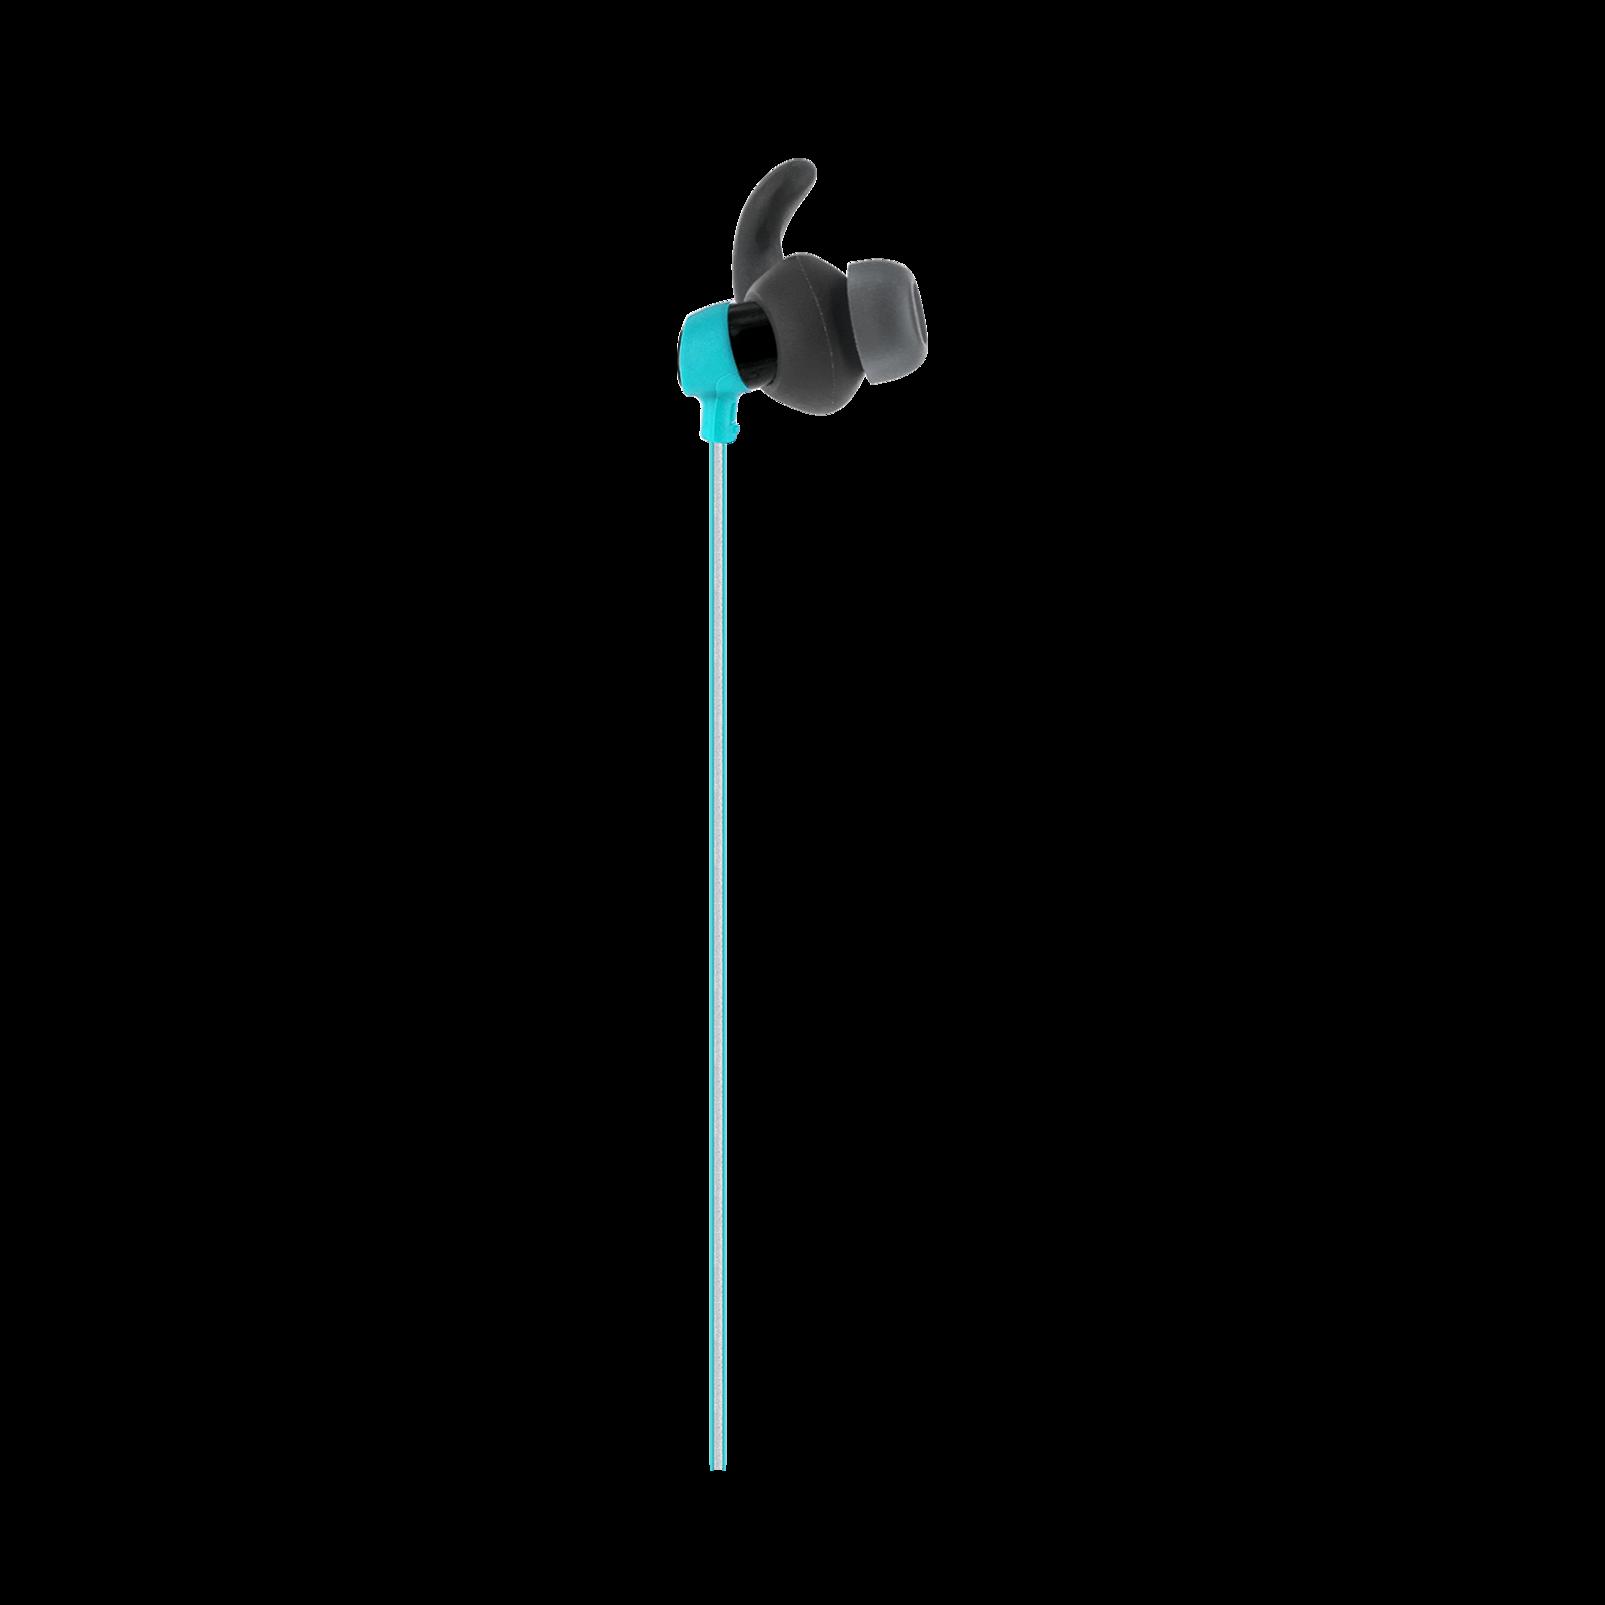 Reflect Mini - Teal - Lightweight, in-ear sport headphones - Detailshot 6